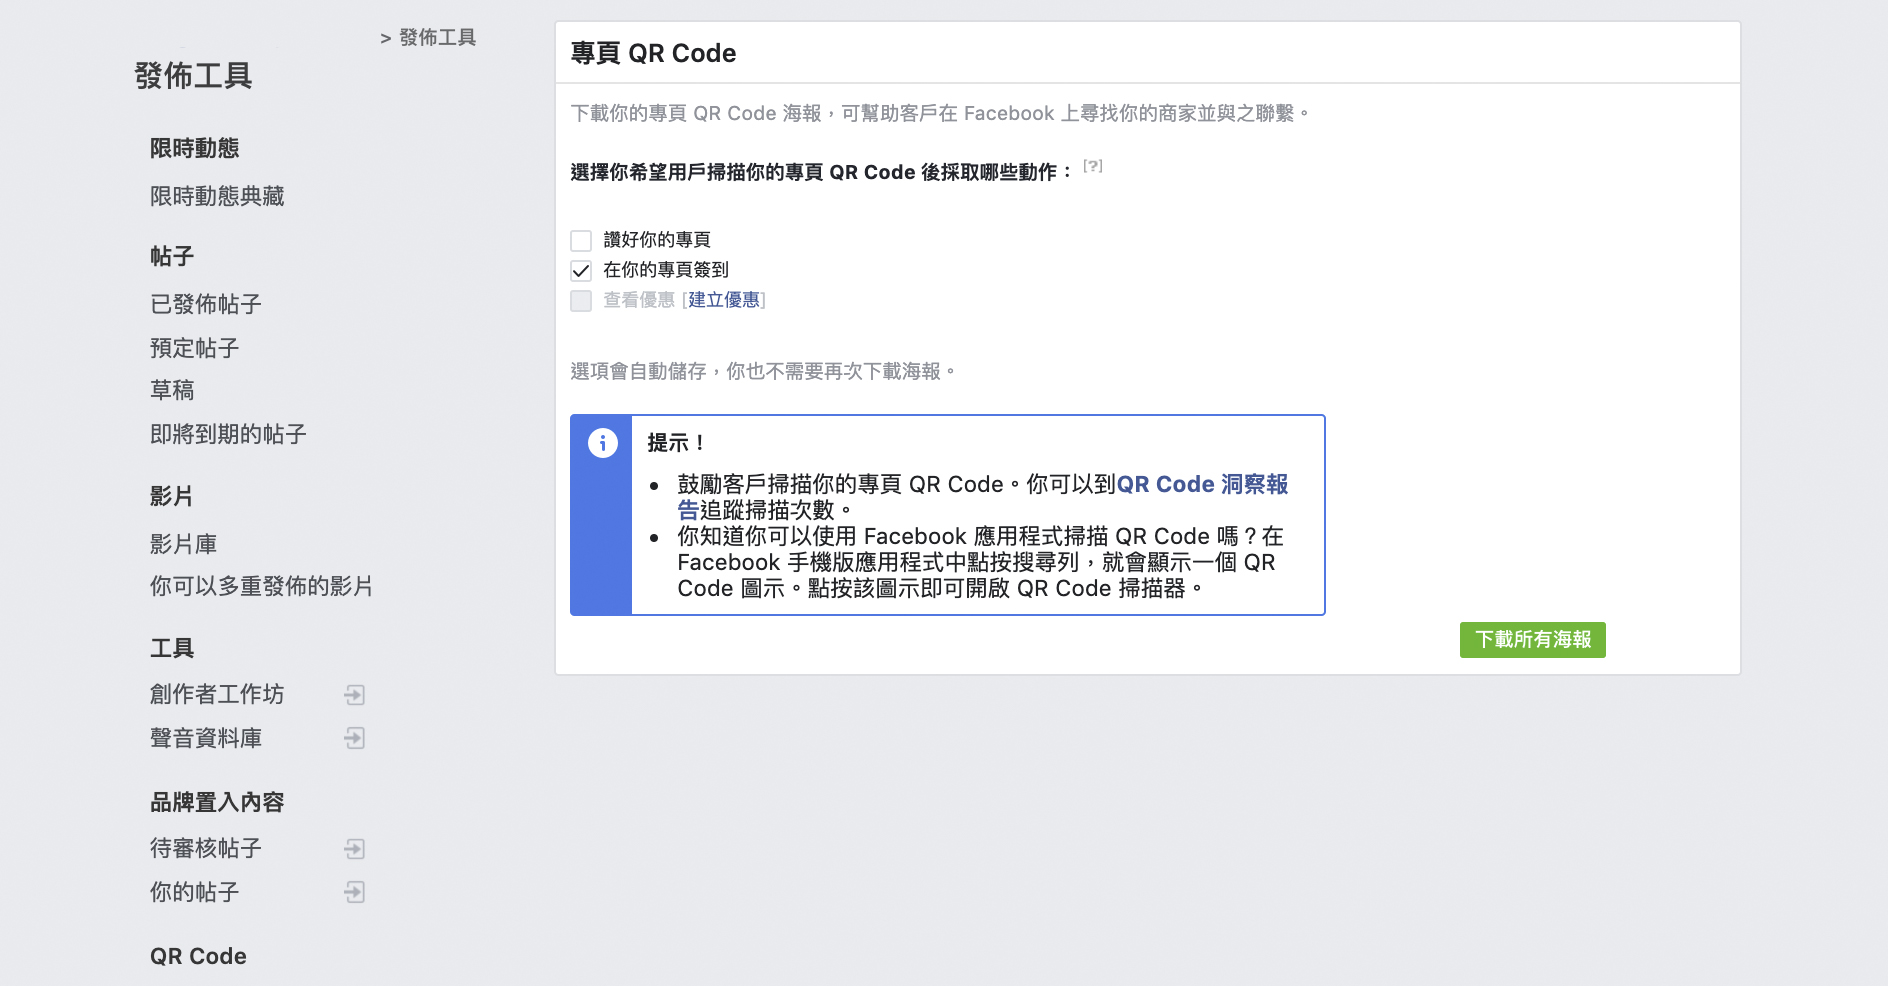 Facebook 專頁的官方 QR Code 在哪裡?為何要使用?